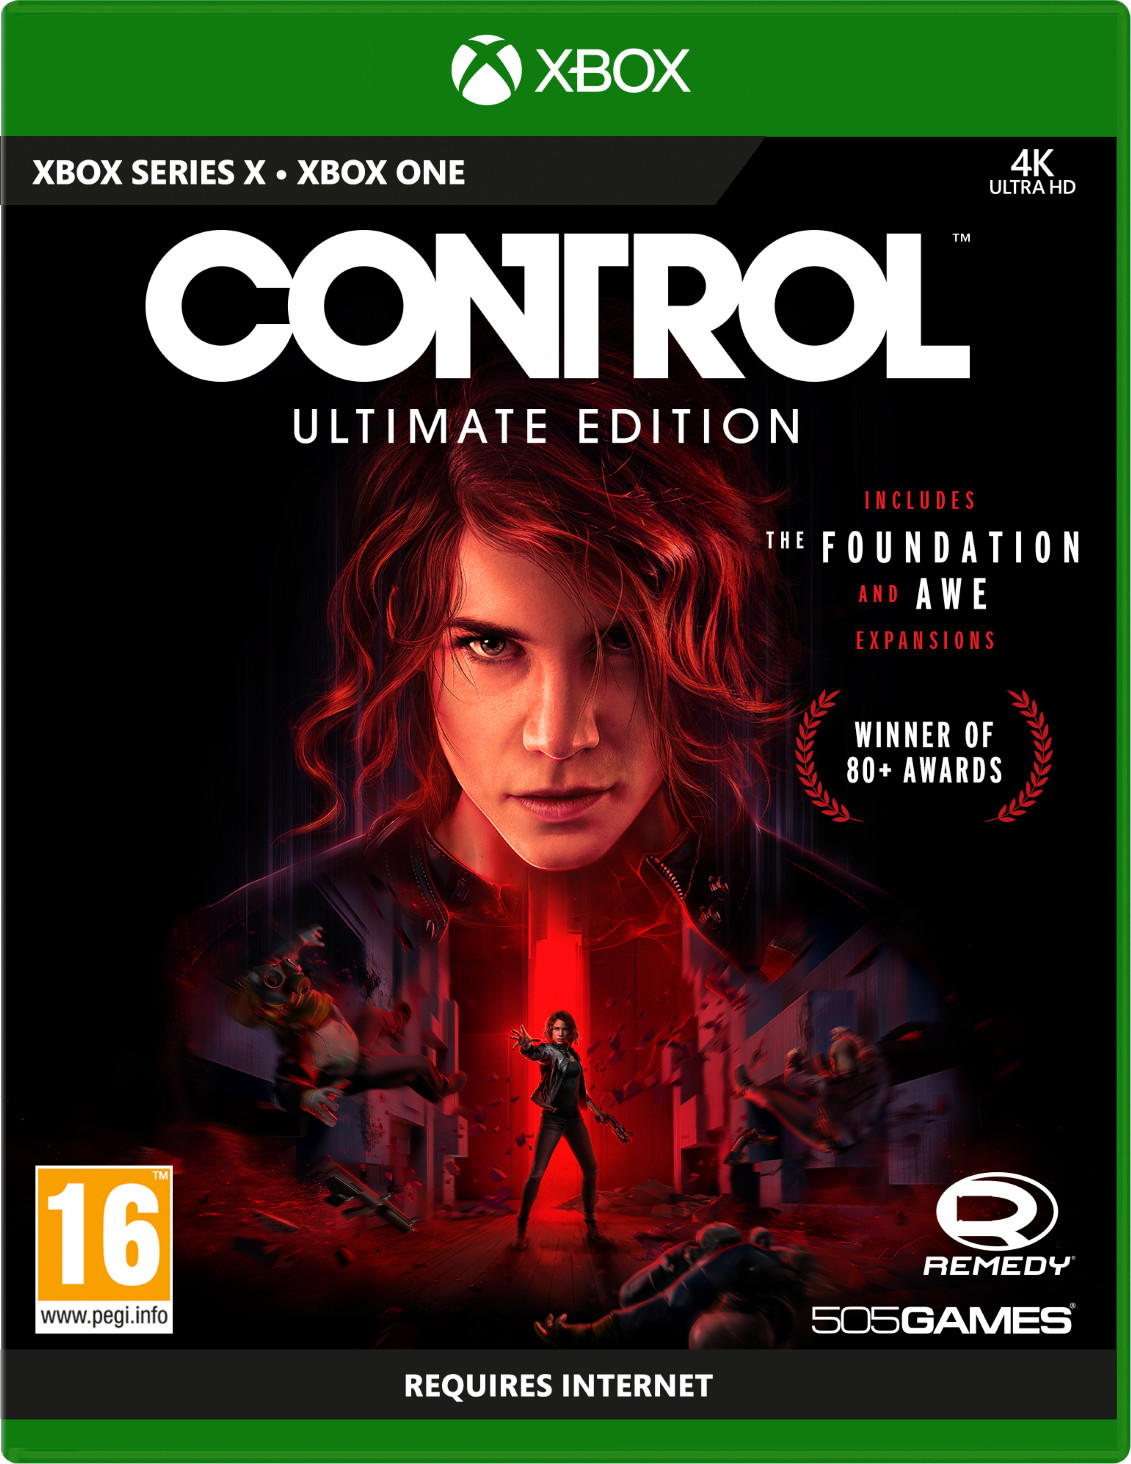 CONTROL Ultimate Edition (GRA XBOX ONE / XBOX SERIES X)